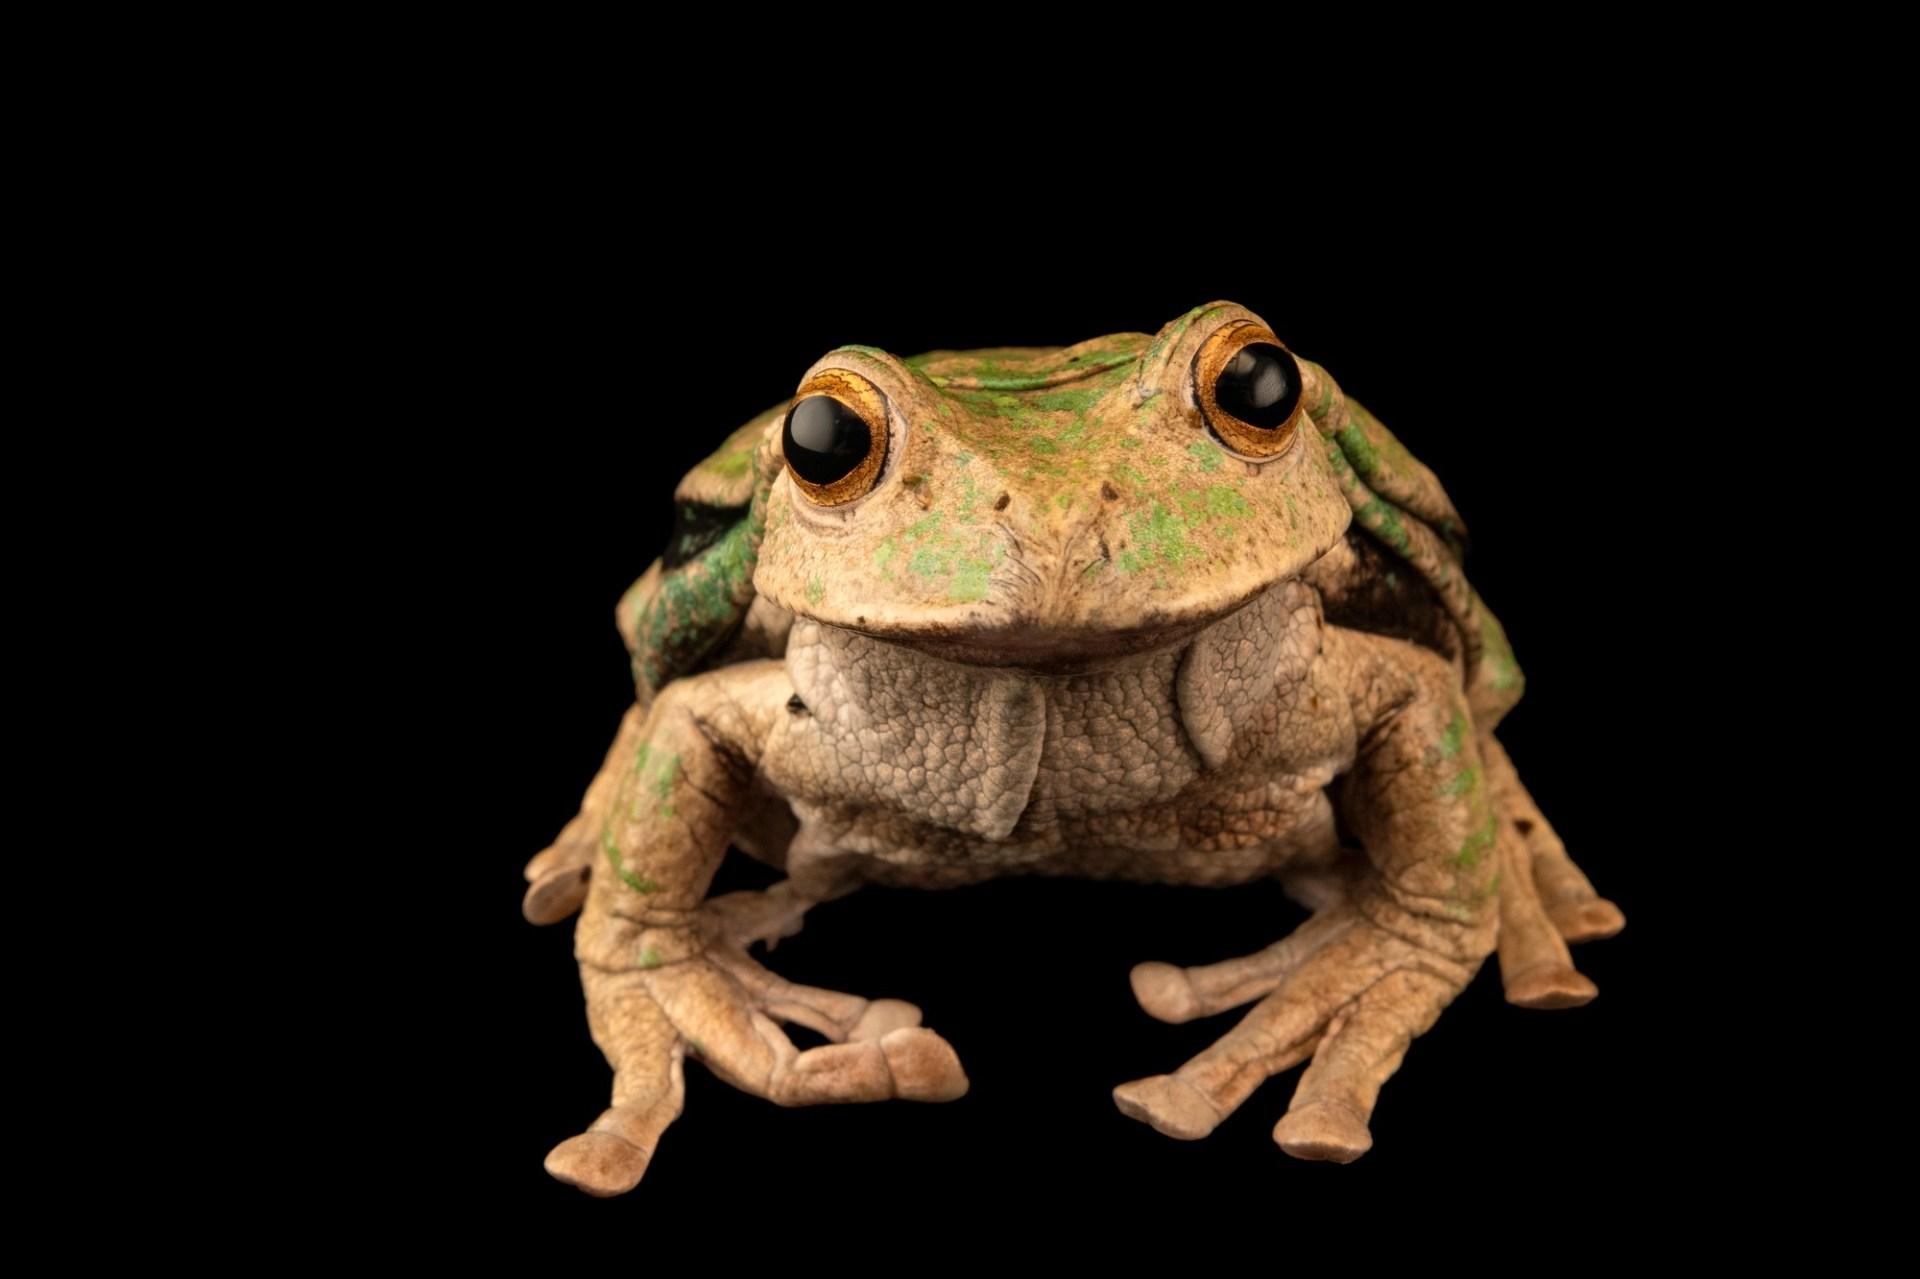 Photo: A male turtle carapaced marsupial frog (Gastrotheca testudinea) at Centro Jambatu.